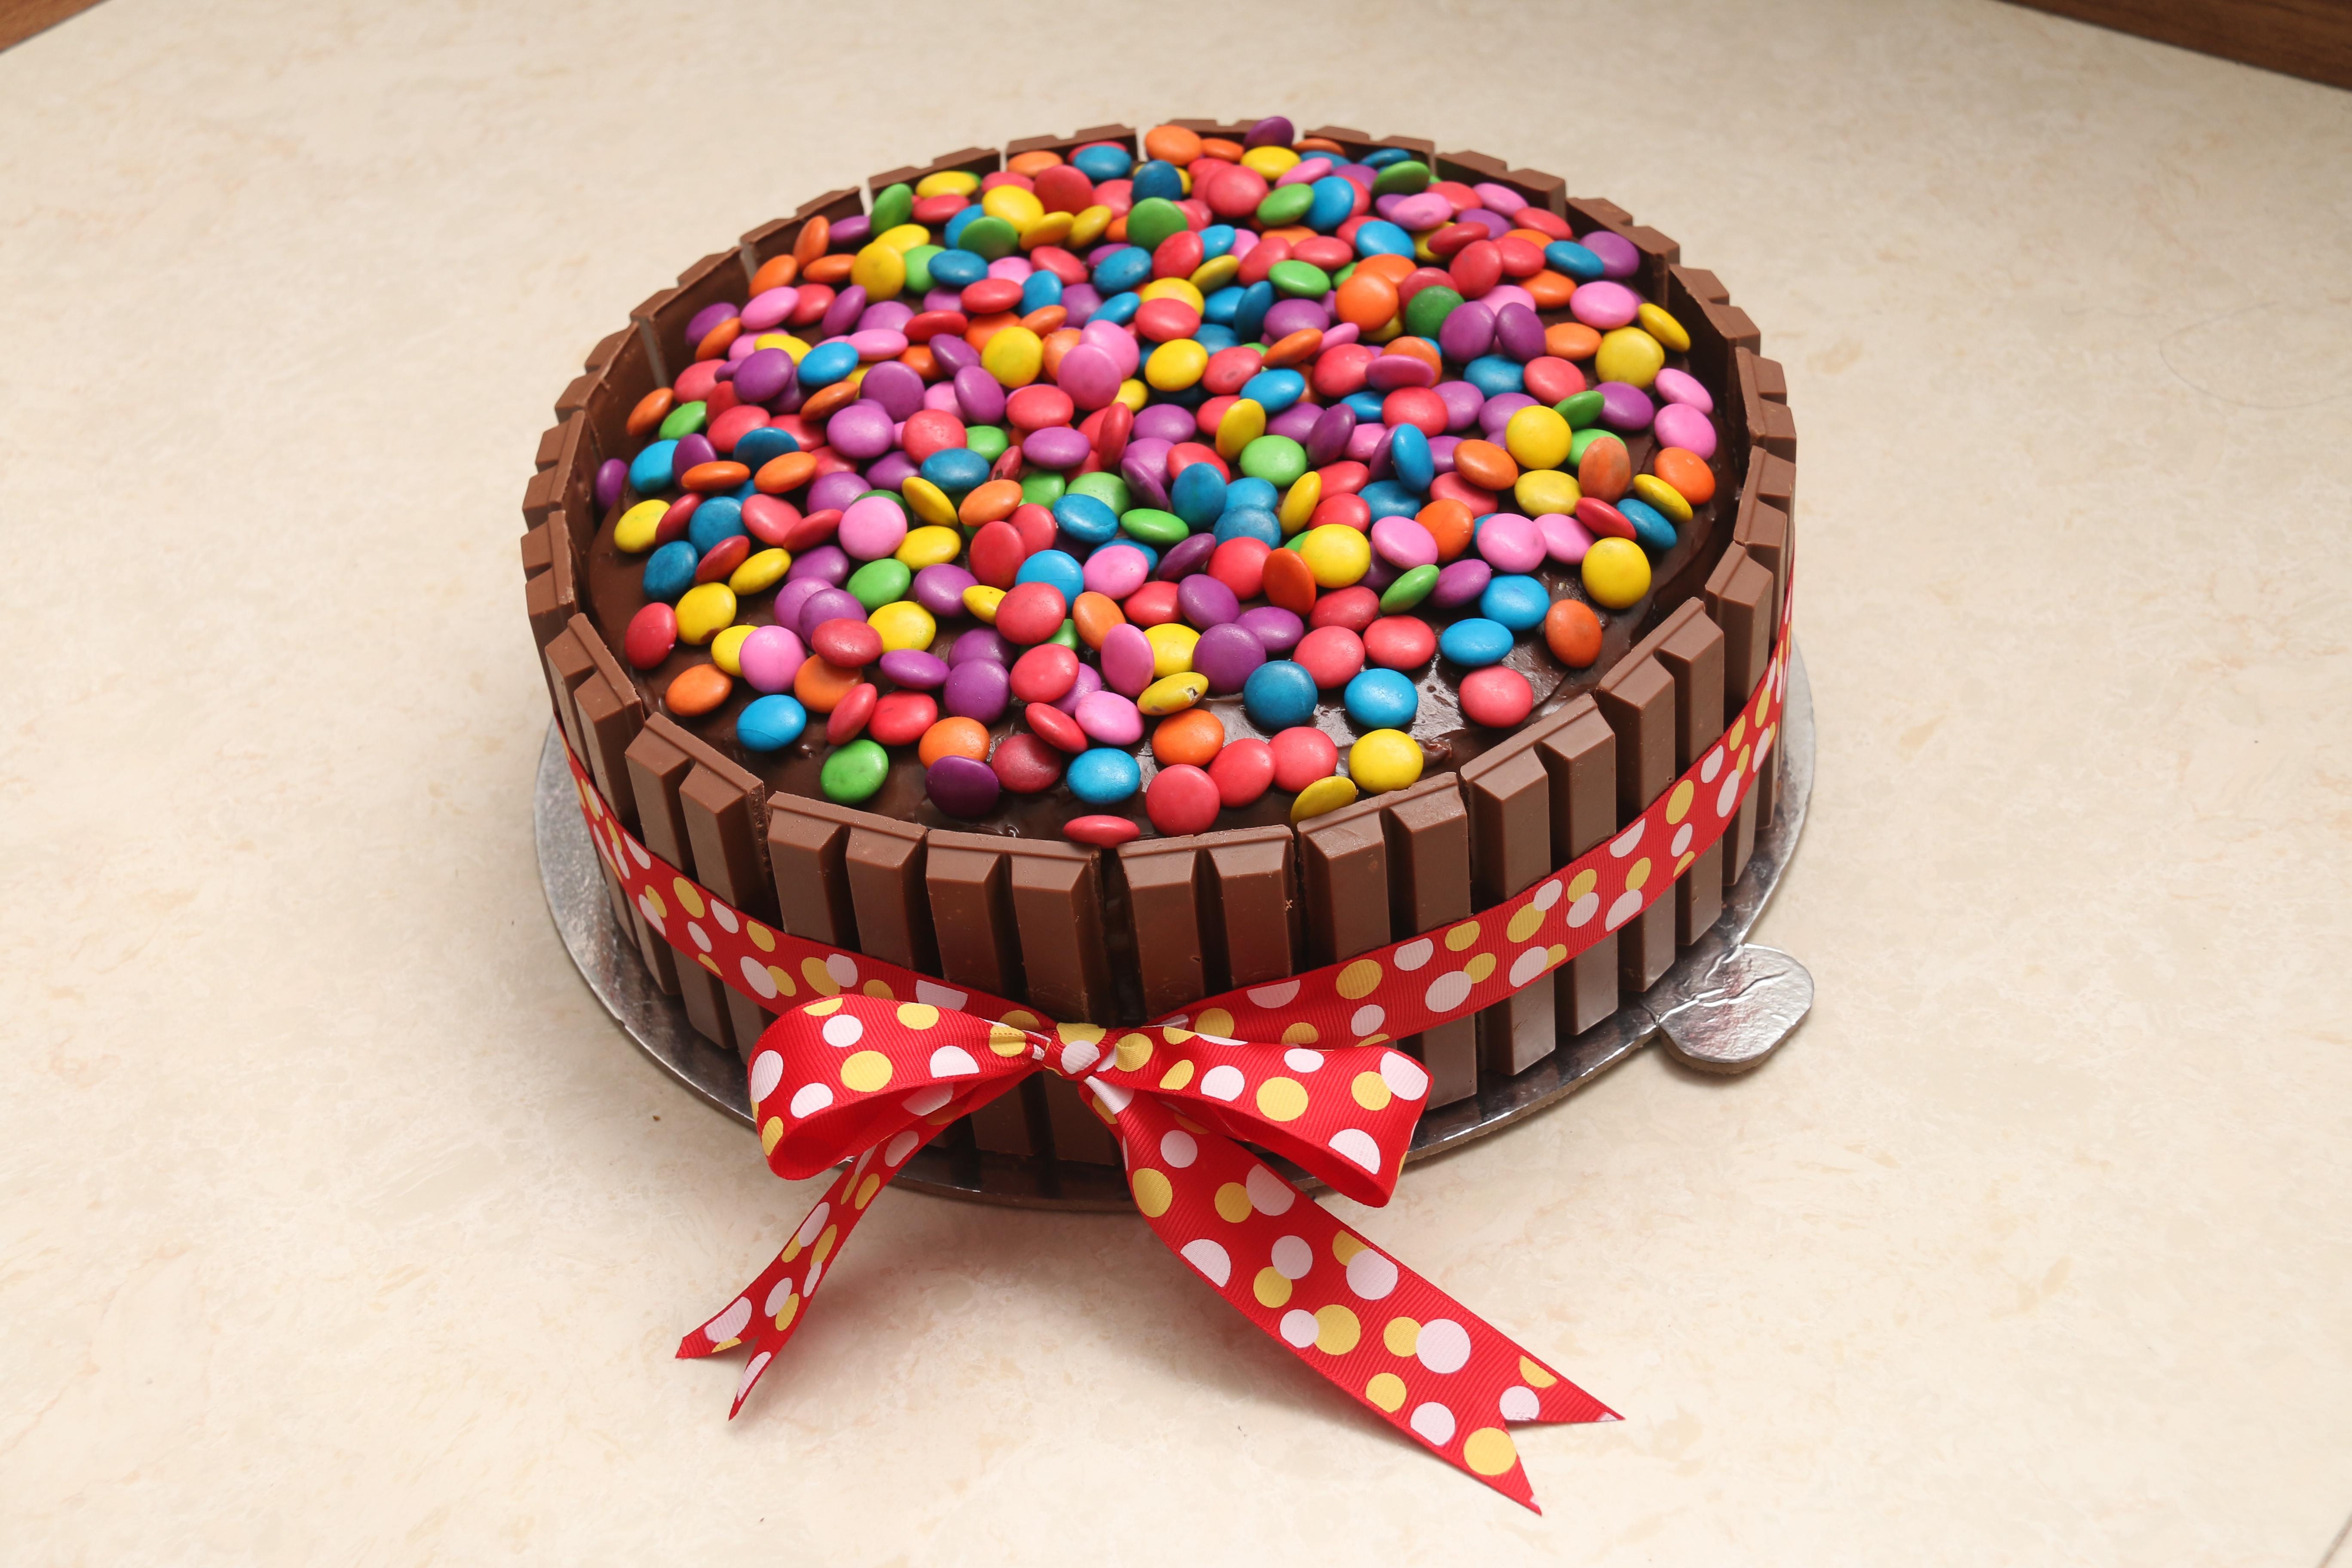 decoracin comida chocolate postre pastel horneado pastel de cumpleaos formacin de hielo fiesta aniversario cumpleaos dulzura